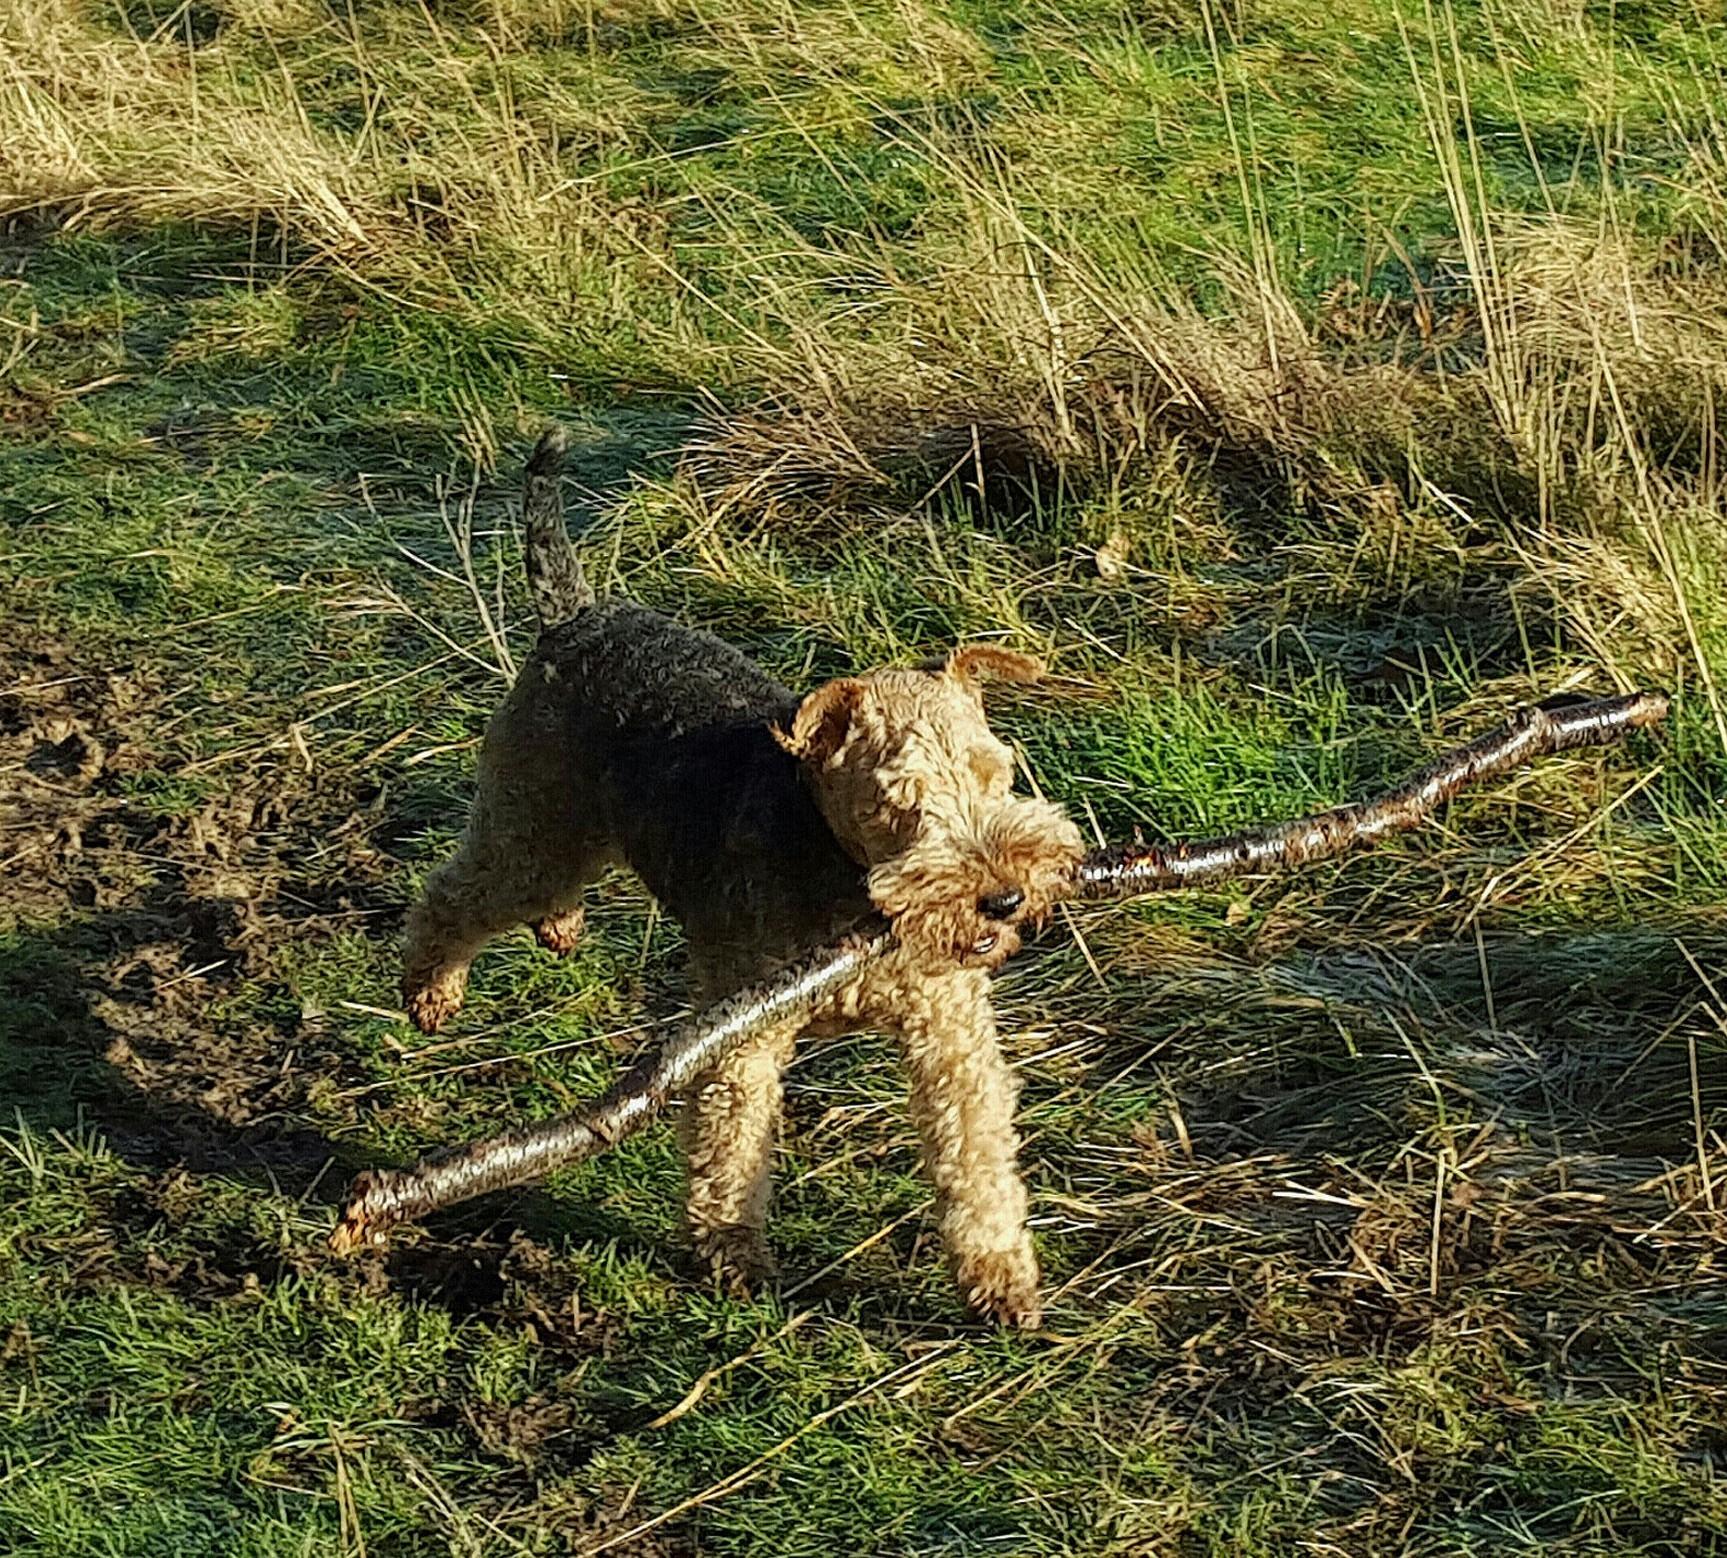 Throwing sticks for dogs warning